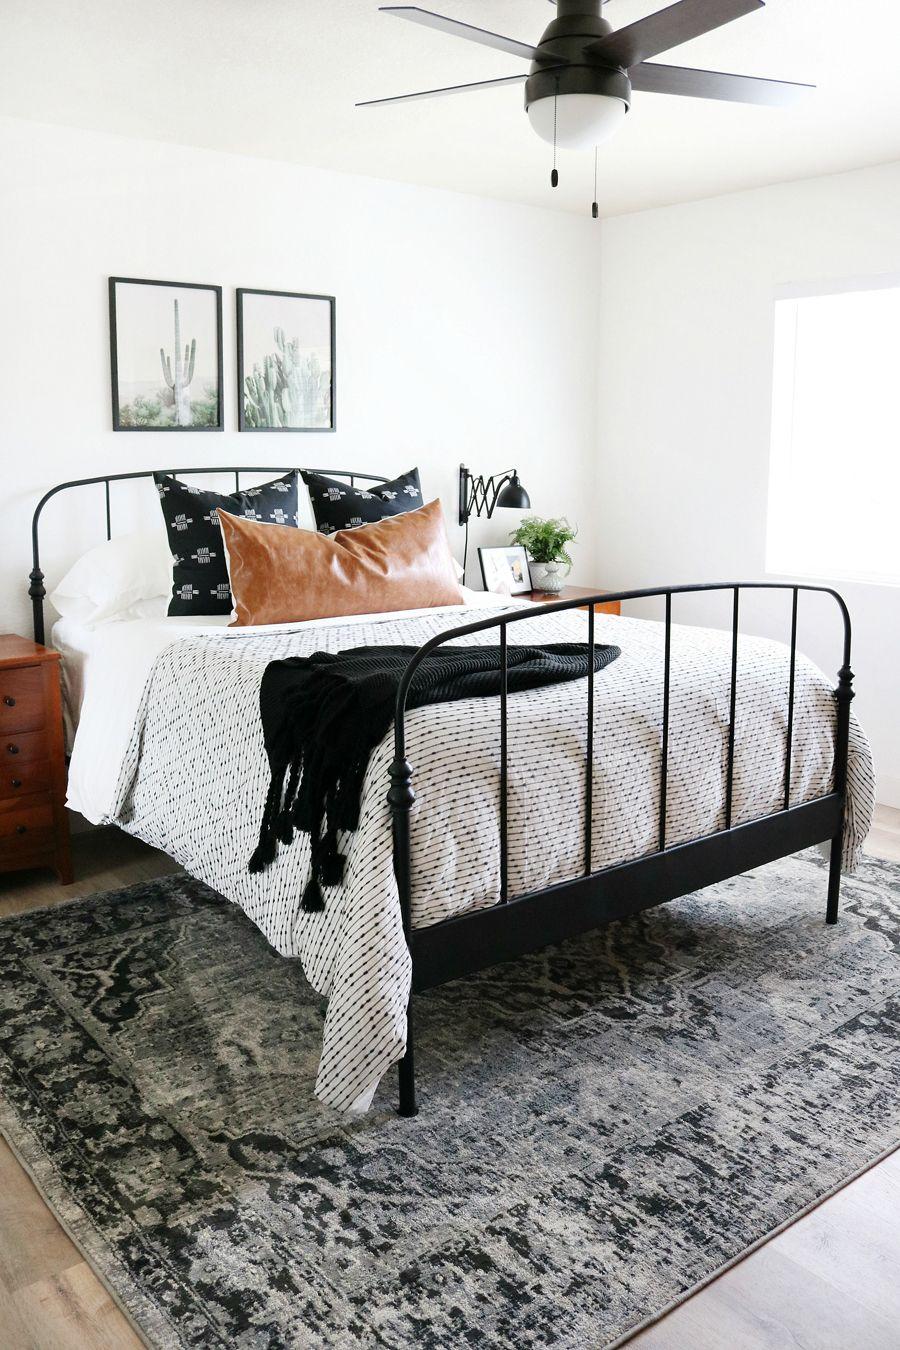 26 Adorable Cream Boho Bedroom Decortez Black Bedroom Furniture Bedroom Inspirations Bedroom Inspiration Boho